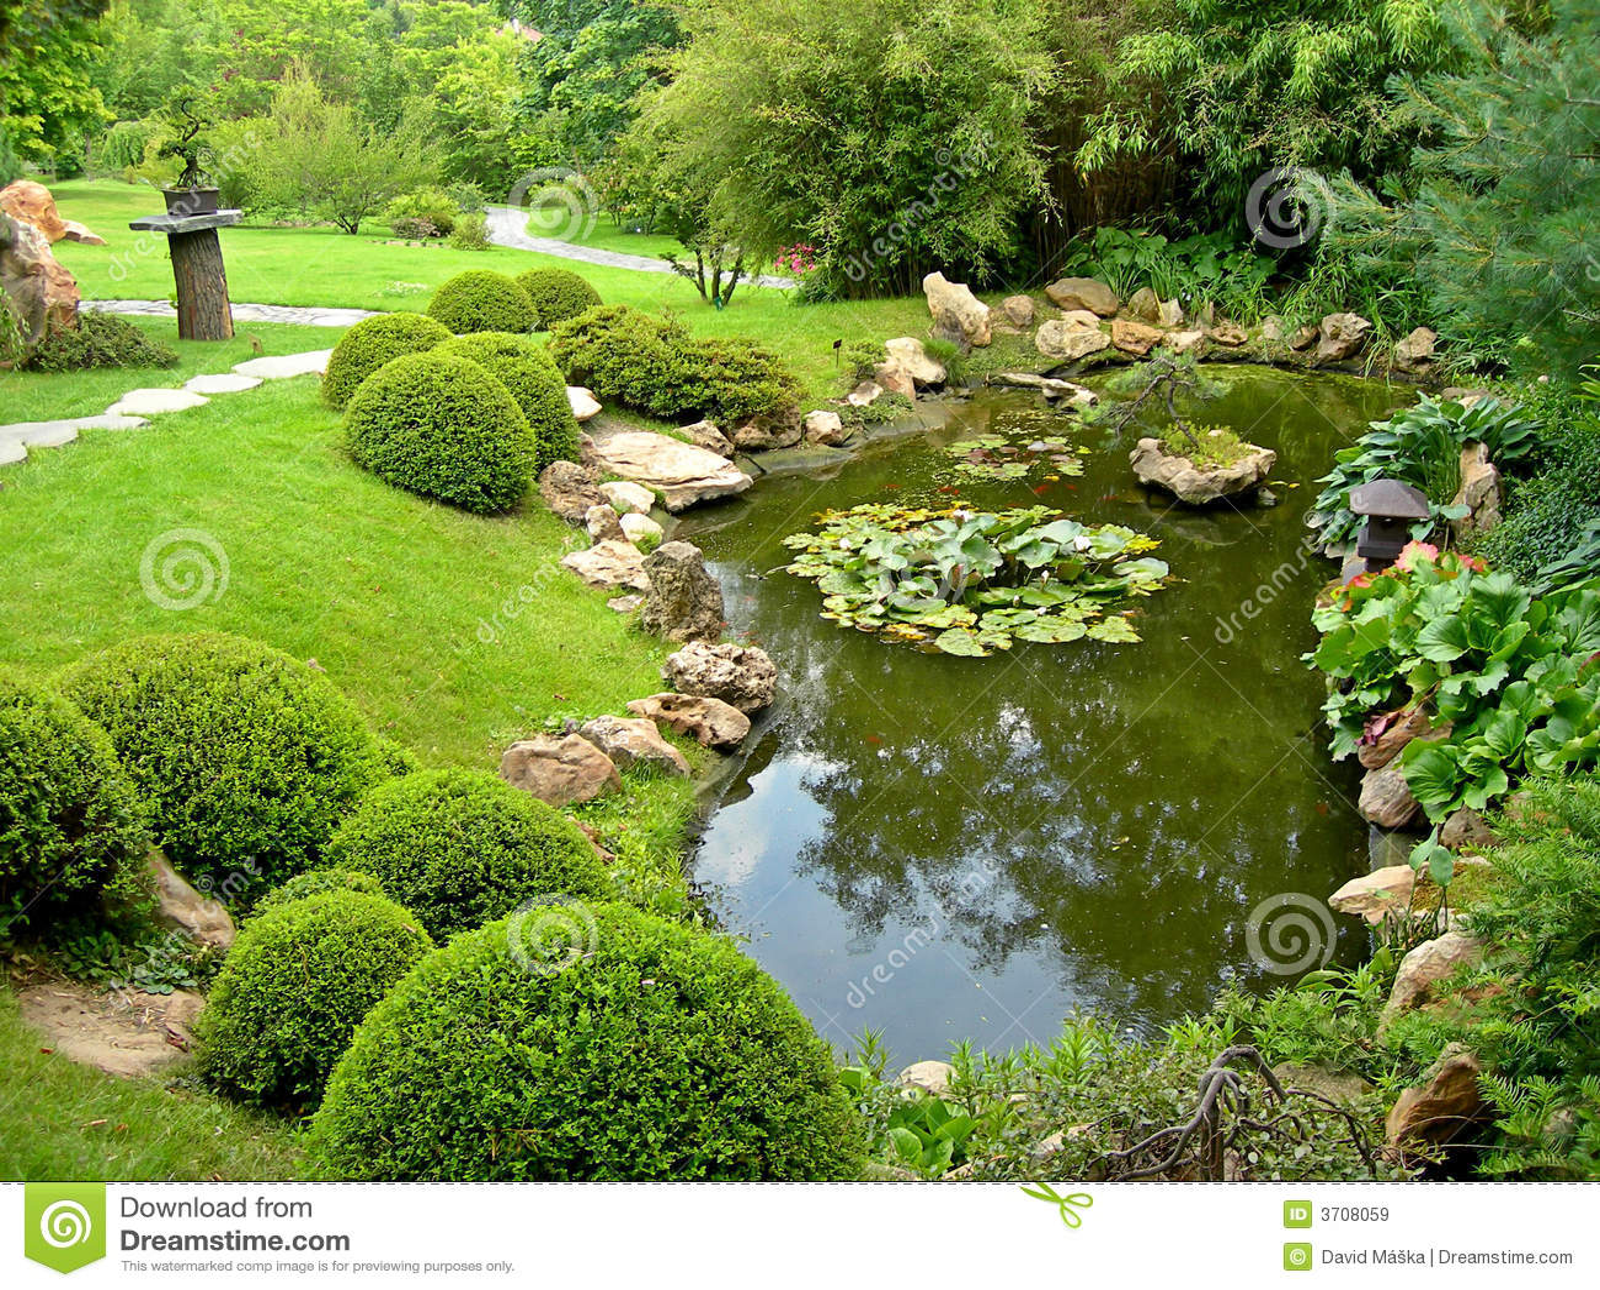 Idee kleine japanse tuinen : Japanse Tuin En Vijver Royalty-vrije Stock Afbeeldingen - Afbeelding ...